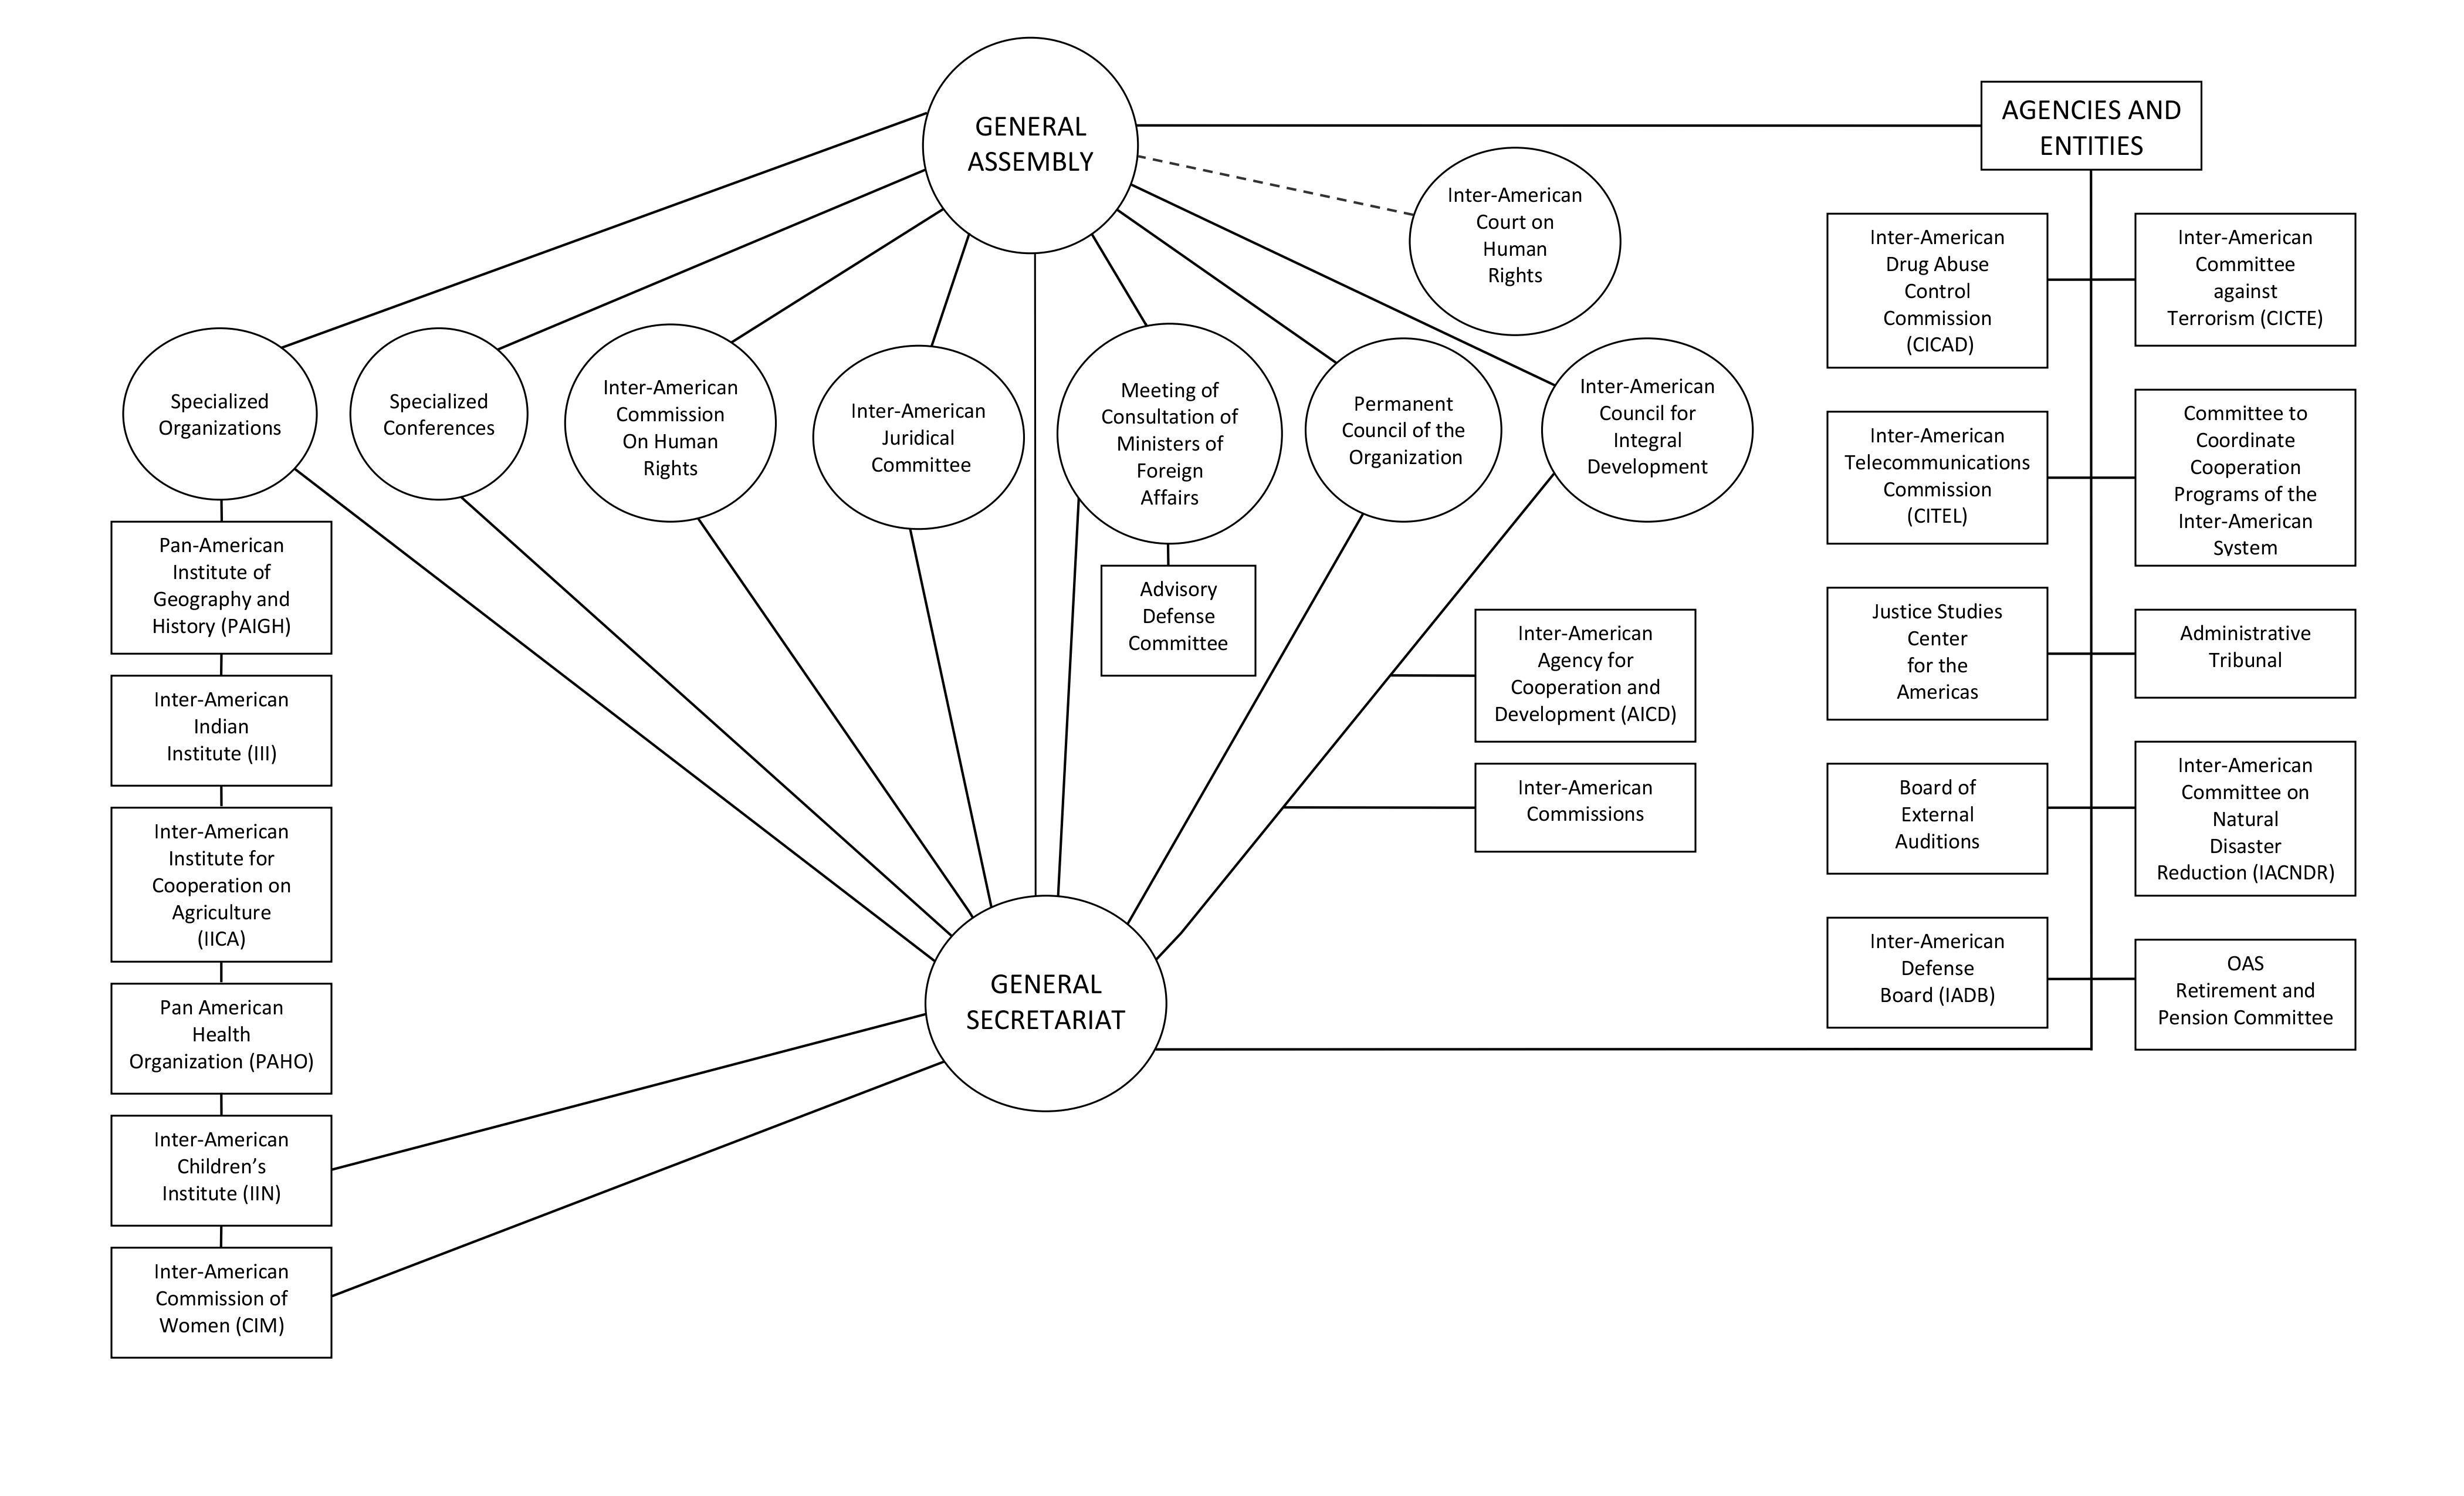 Organizationchat moreover Hqdefault besides Px Tav Airports Holding Logo Svg besides Ogranogrammachart Eng moreover Ford Motor  pany Organizational Chart Slide. on organizational structure chart